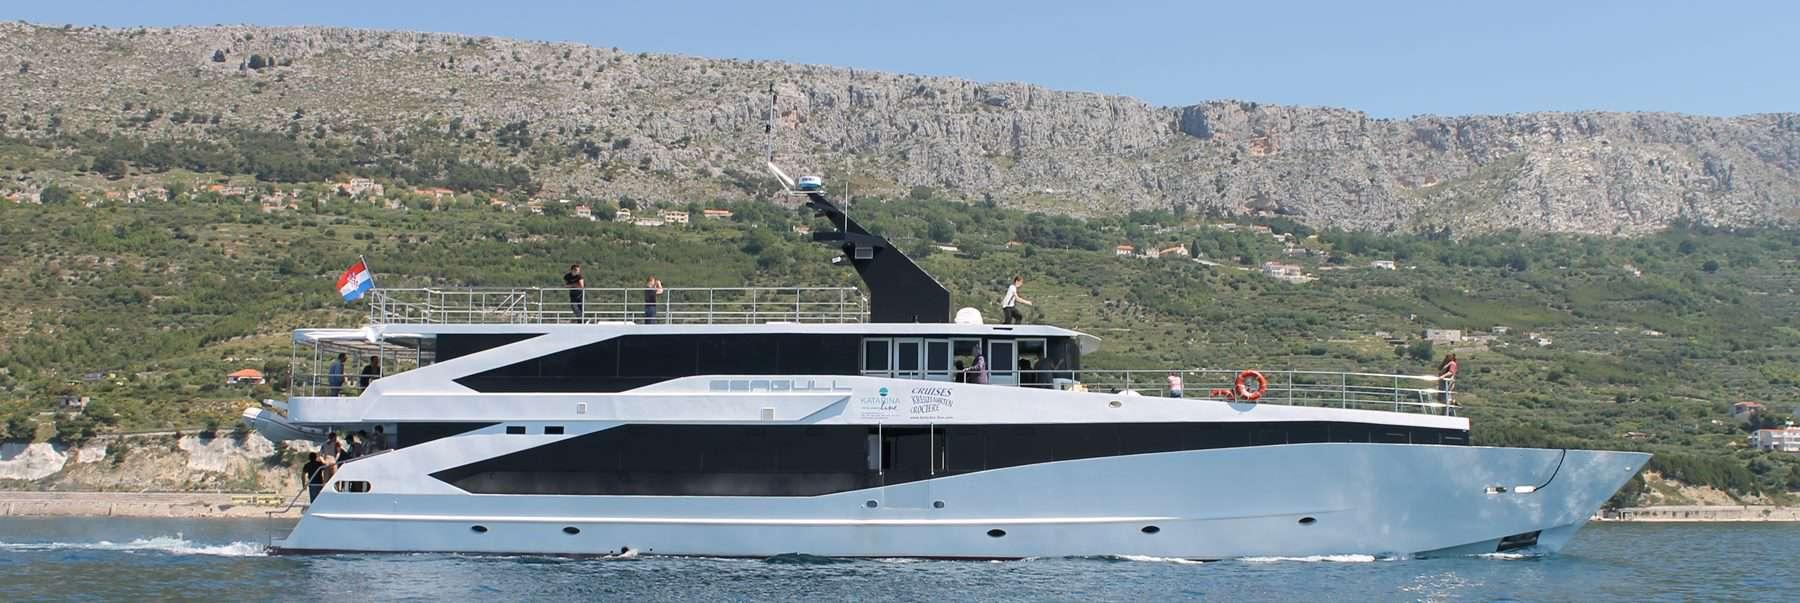 Seagull Cruise Shipm, Croatia